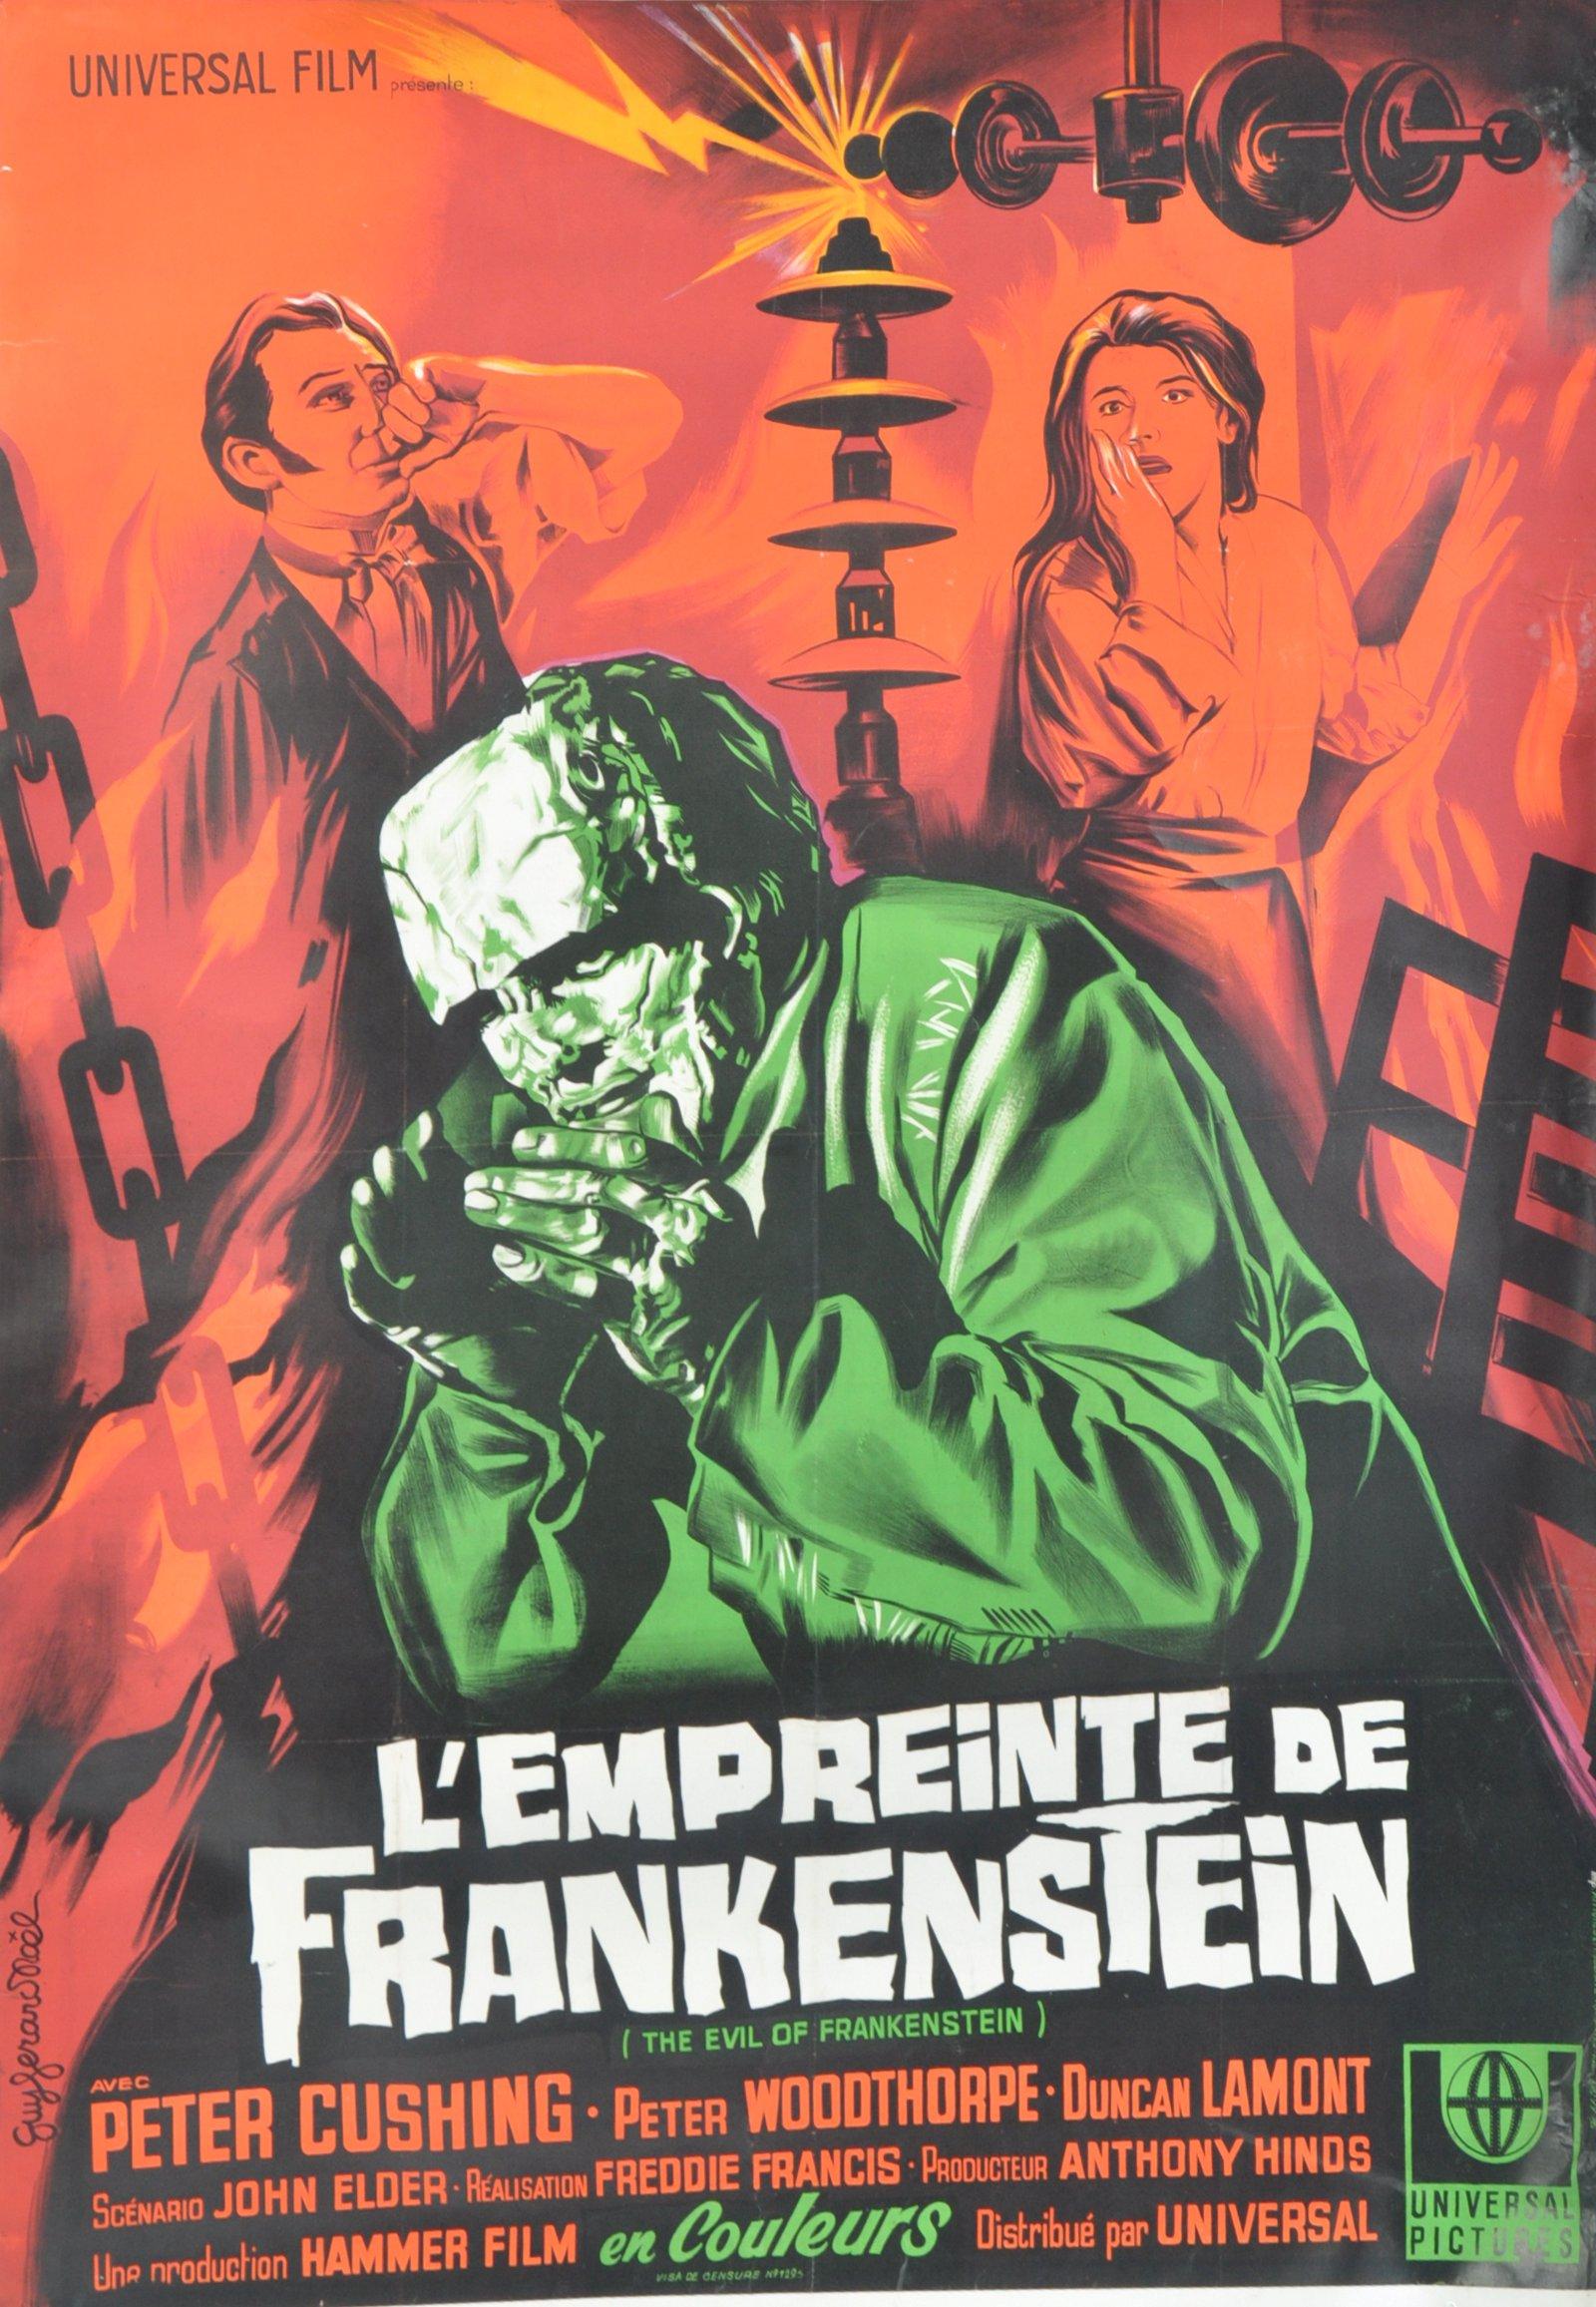 1960'S EVIL OF FRANKENSTEIN FRENCH MOVIE POSTER